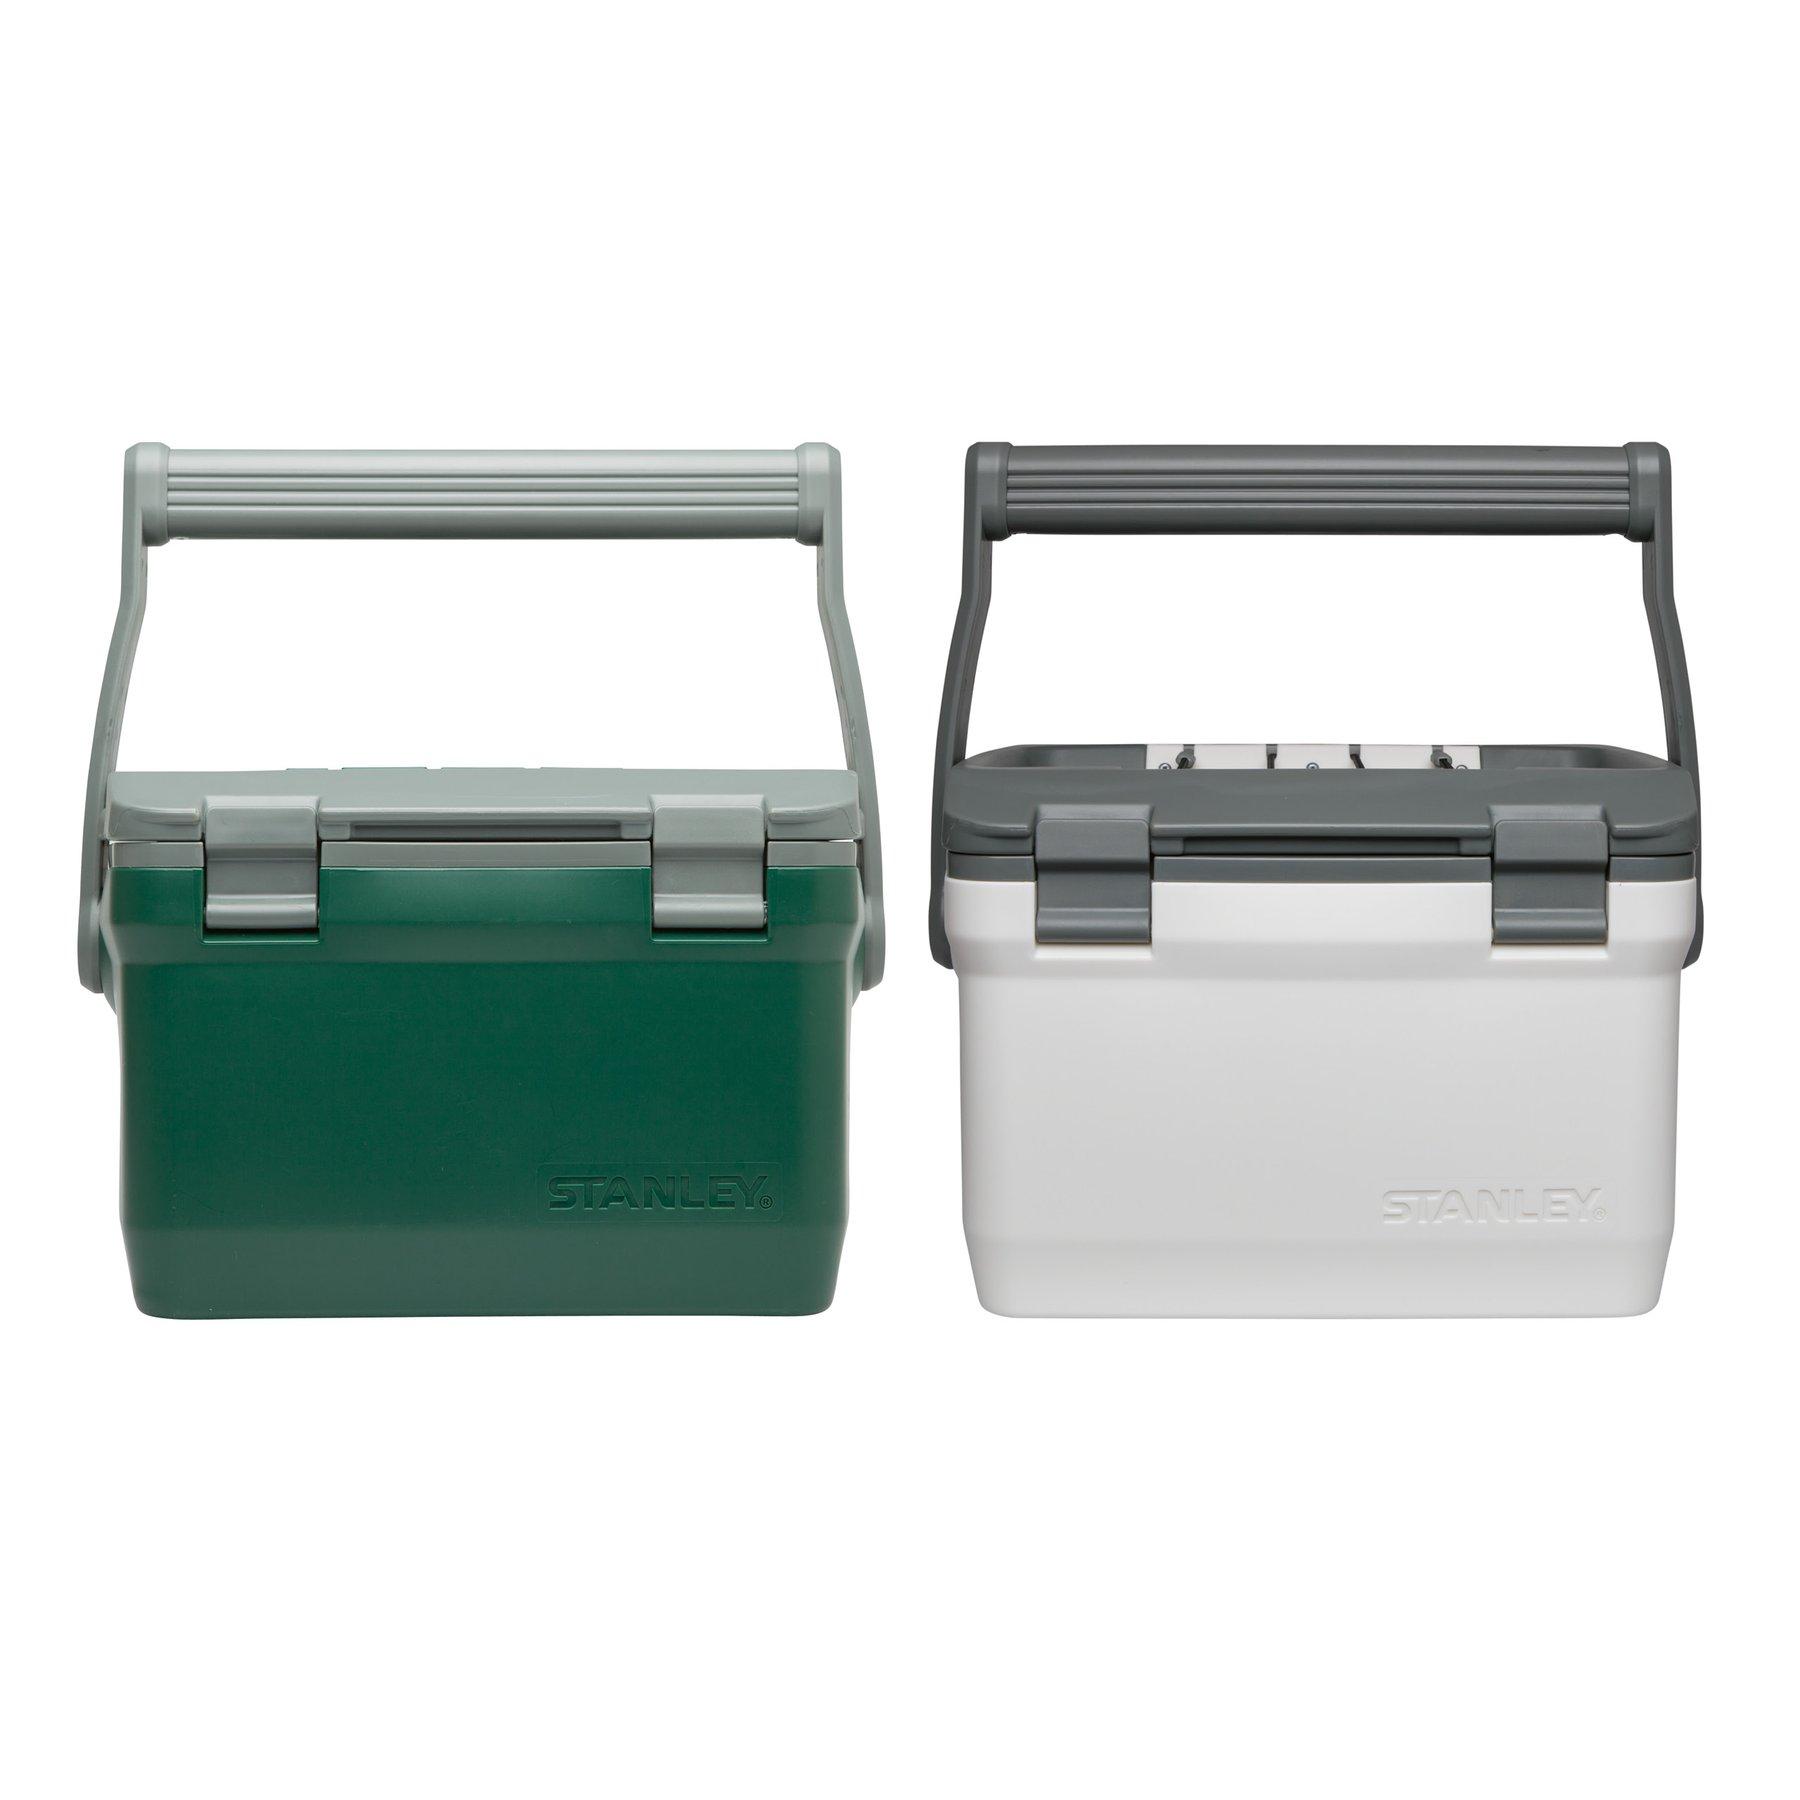 STANLEY ADVENTURE Easy Carry Lunch Cooler 6.6L - Kühlbox